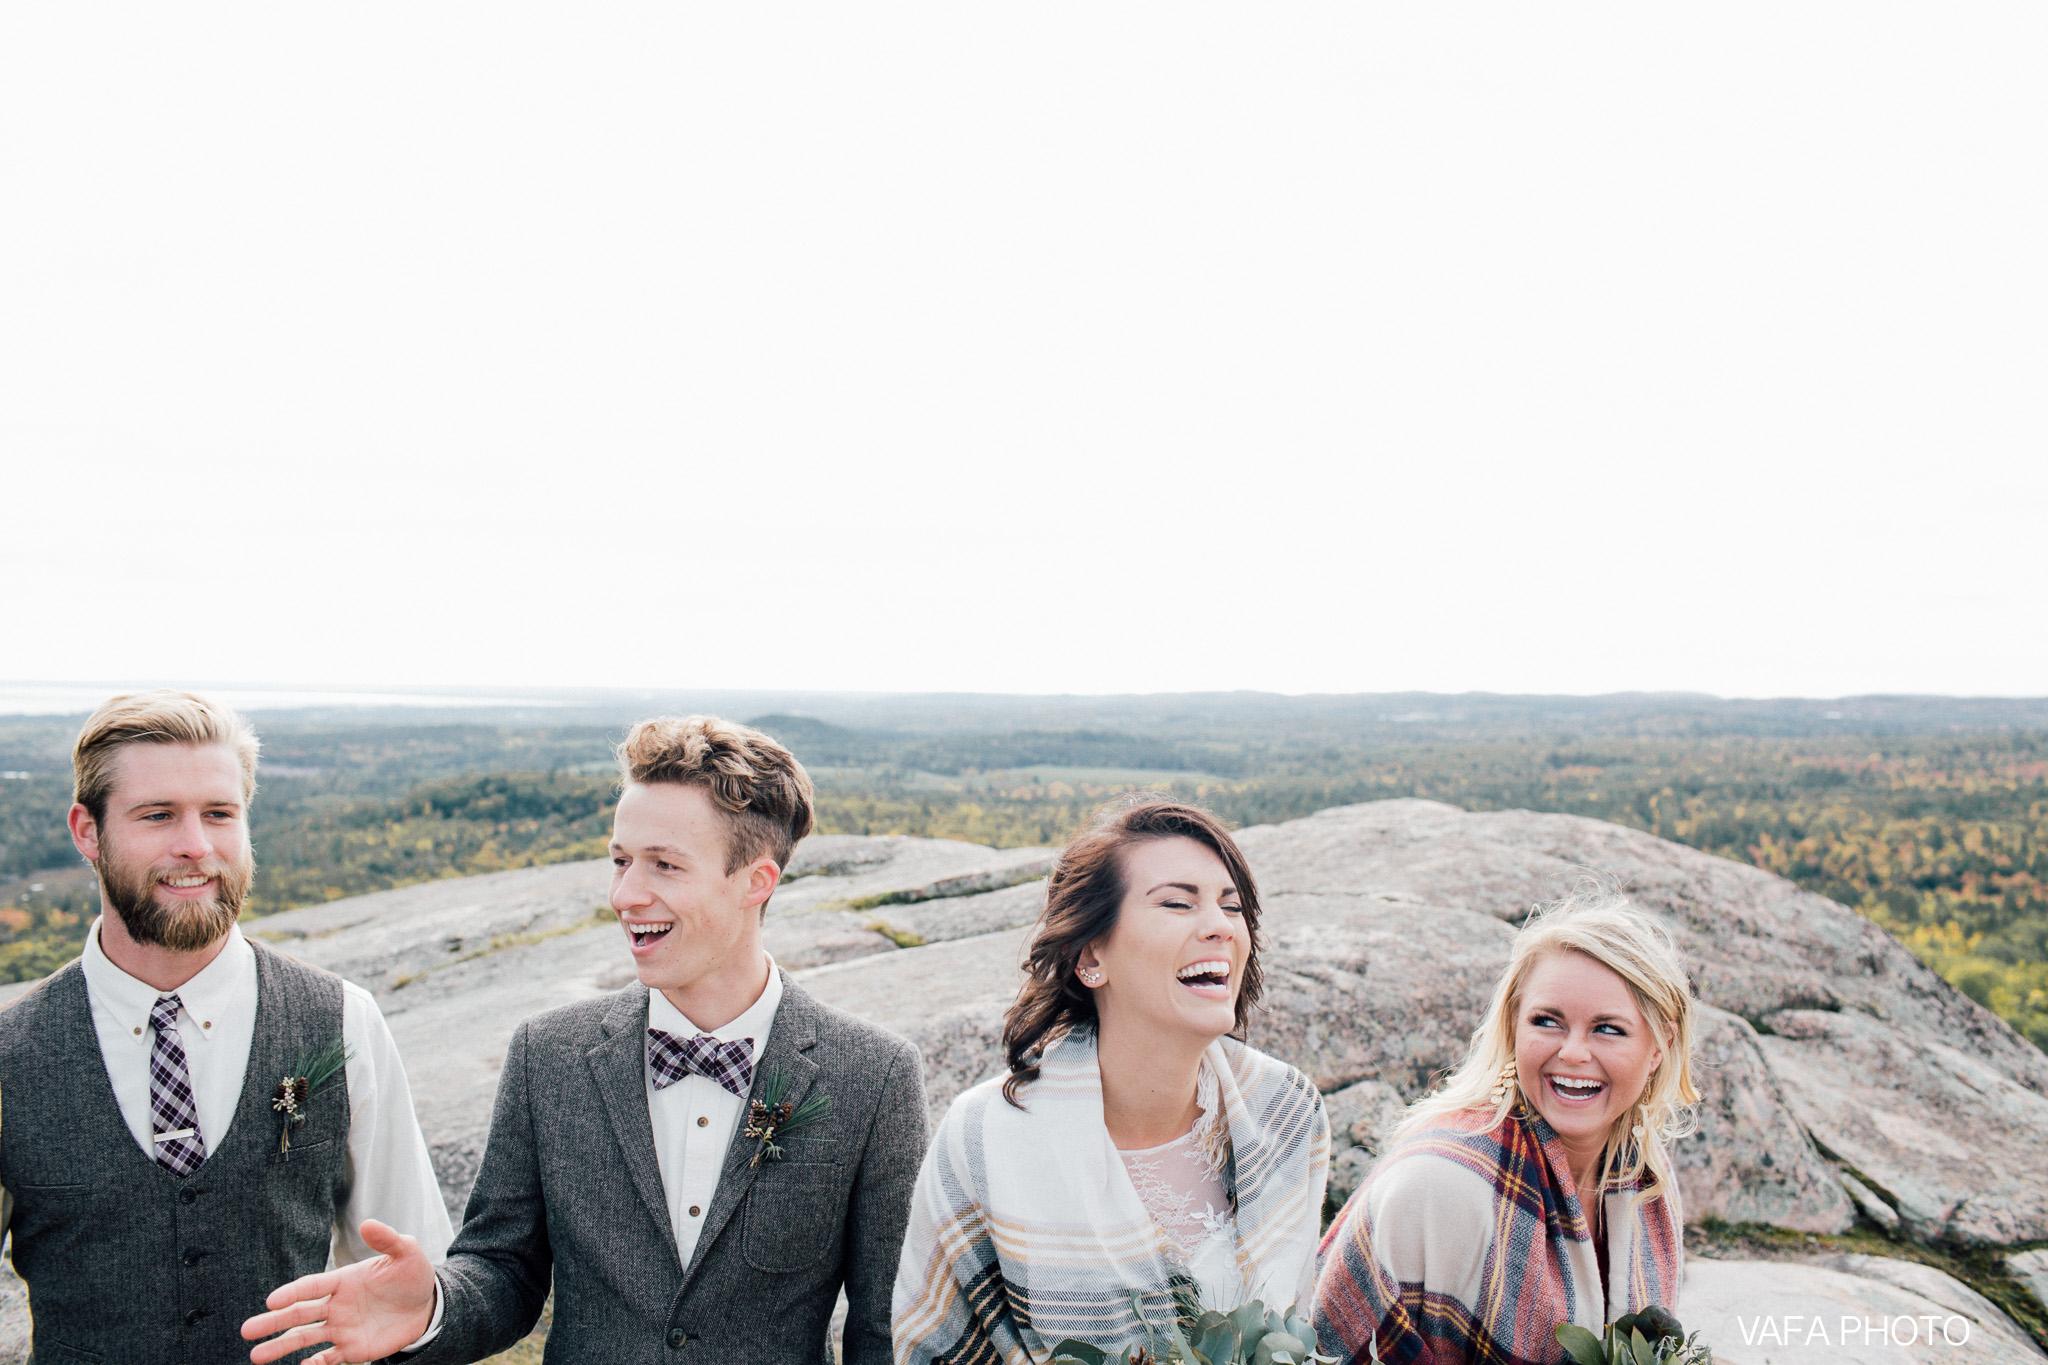 Hogback-Mountain-Wedding-Chelsea-Josh-Vafa-Photo-315.jpg